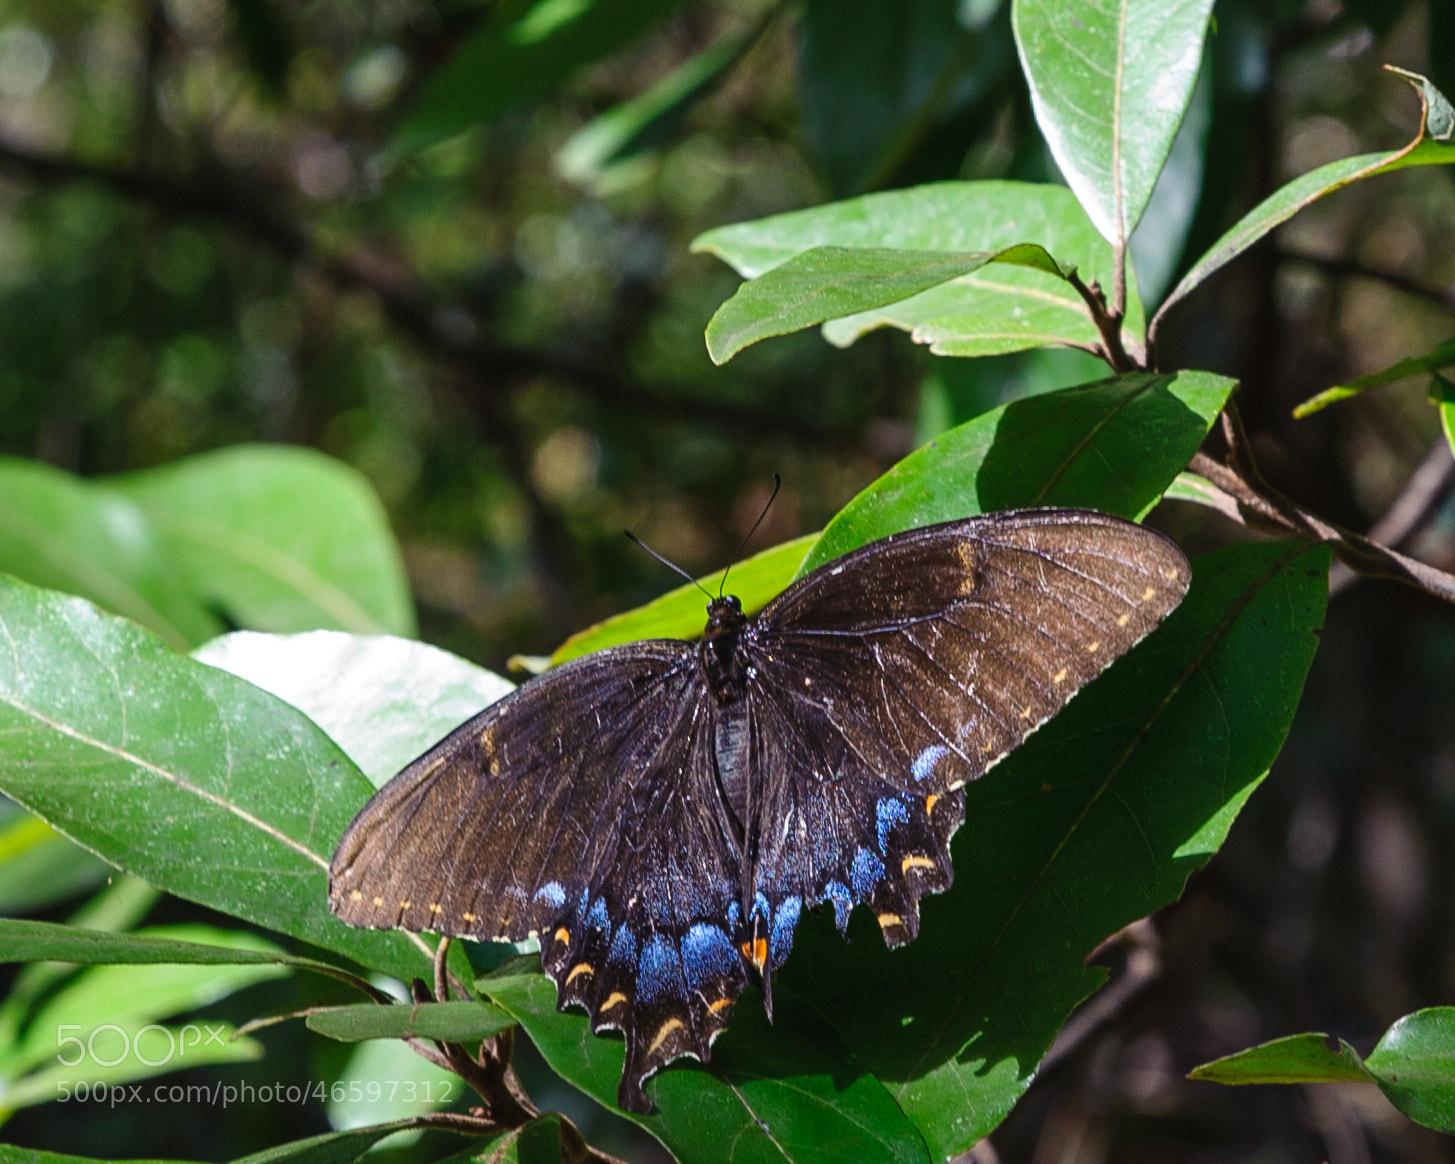 Photograph Butterfly by John Kennington on 500px